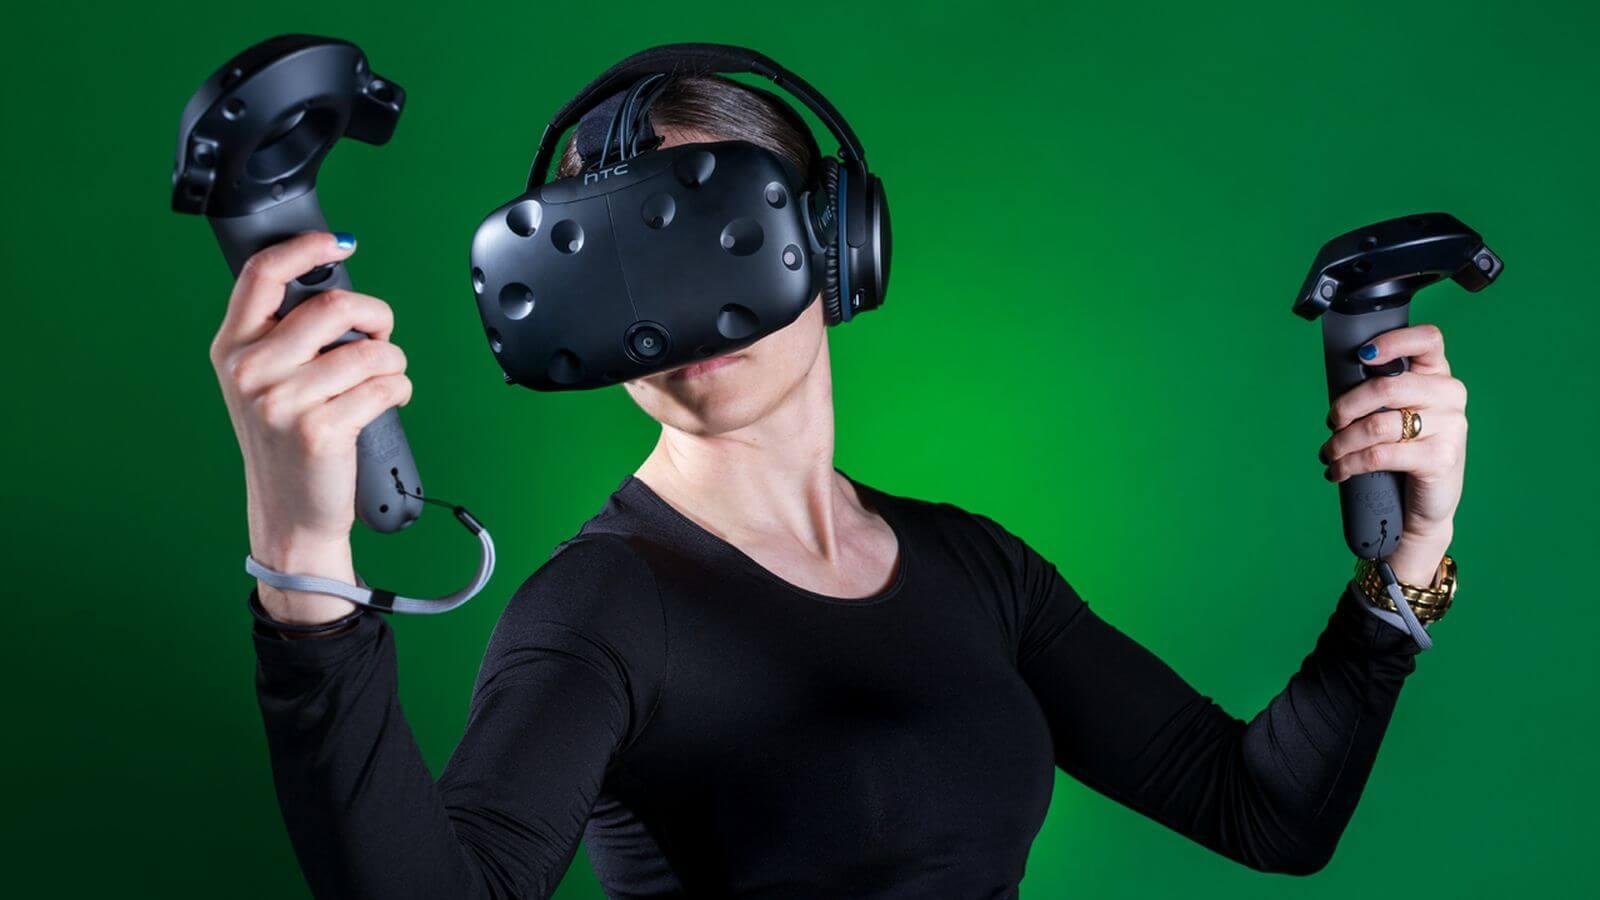 VRG VRV 141 HTC Vive Thumb.0.0 - Steam começa a entrar na onda de realidade virtual